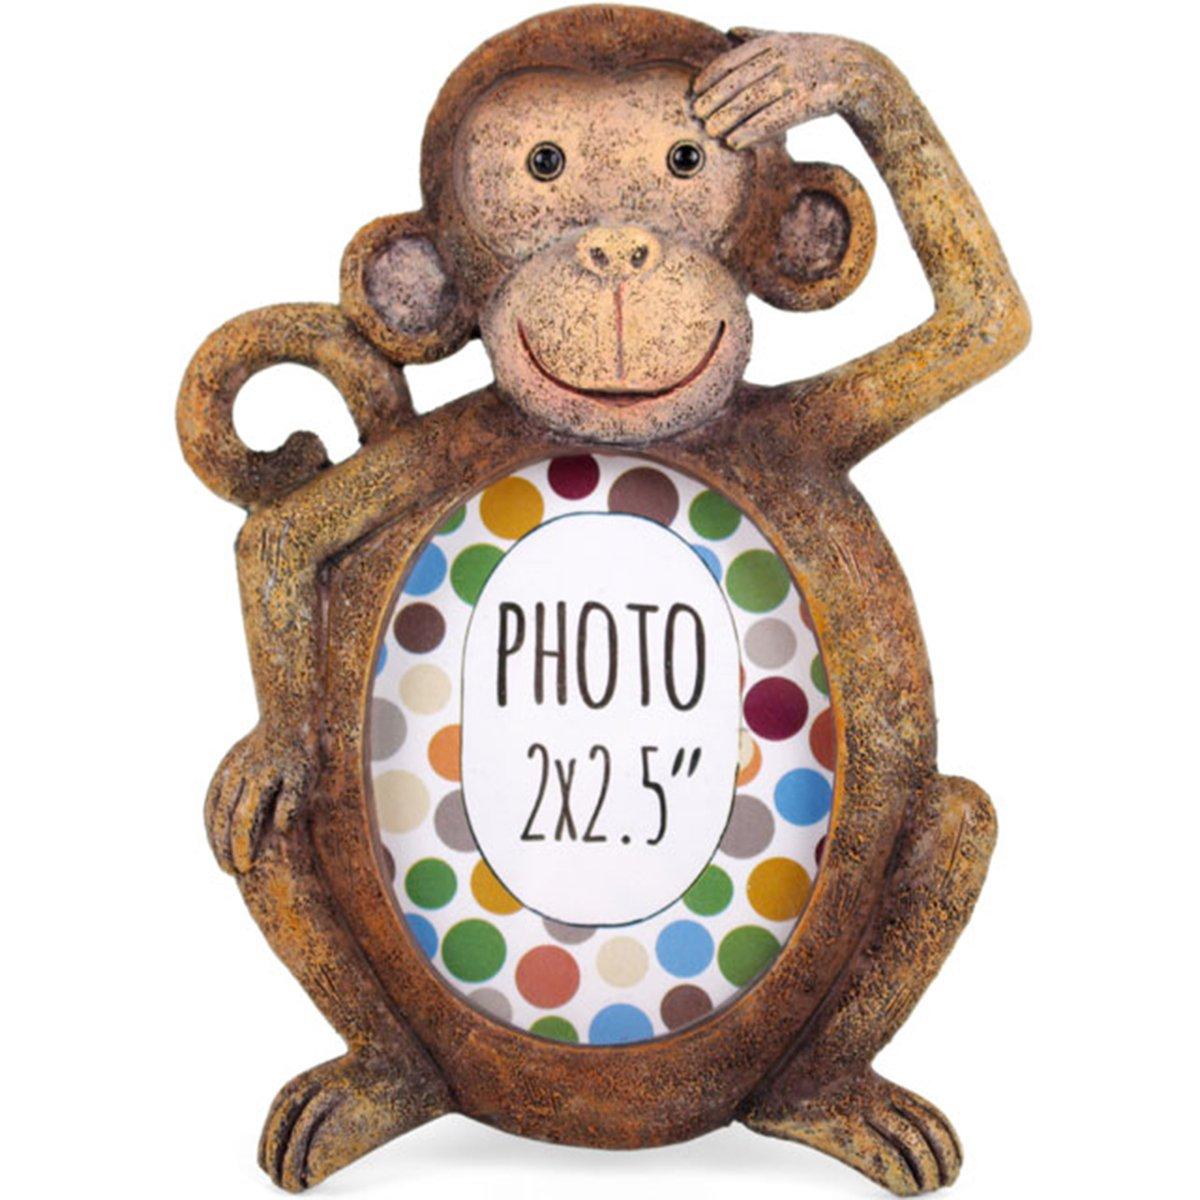 Beautiful Resin Animal Mini Photo Frames Window Living Room Nursery Picture Display Frame. 2 x 2.5 (Monkey) by Ethically Sourced   B01IDARMFE